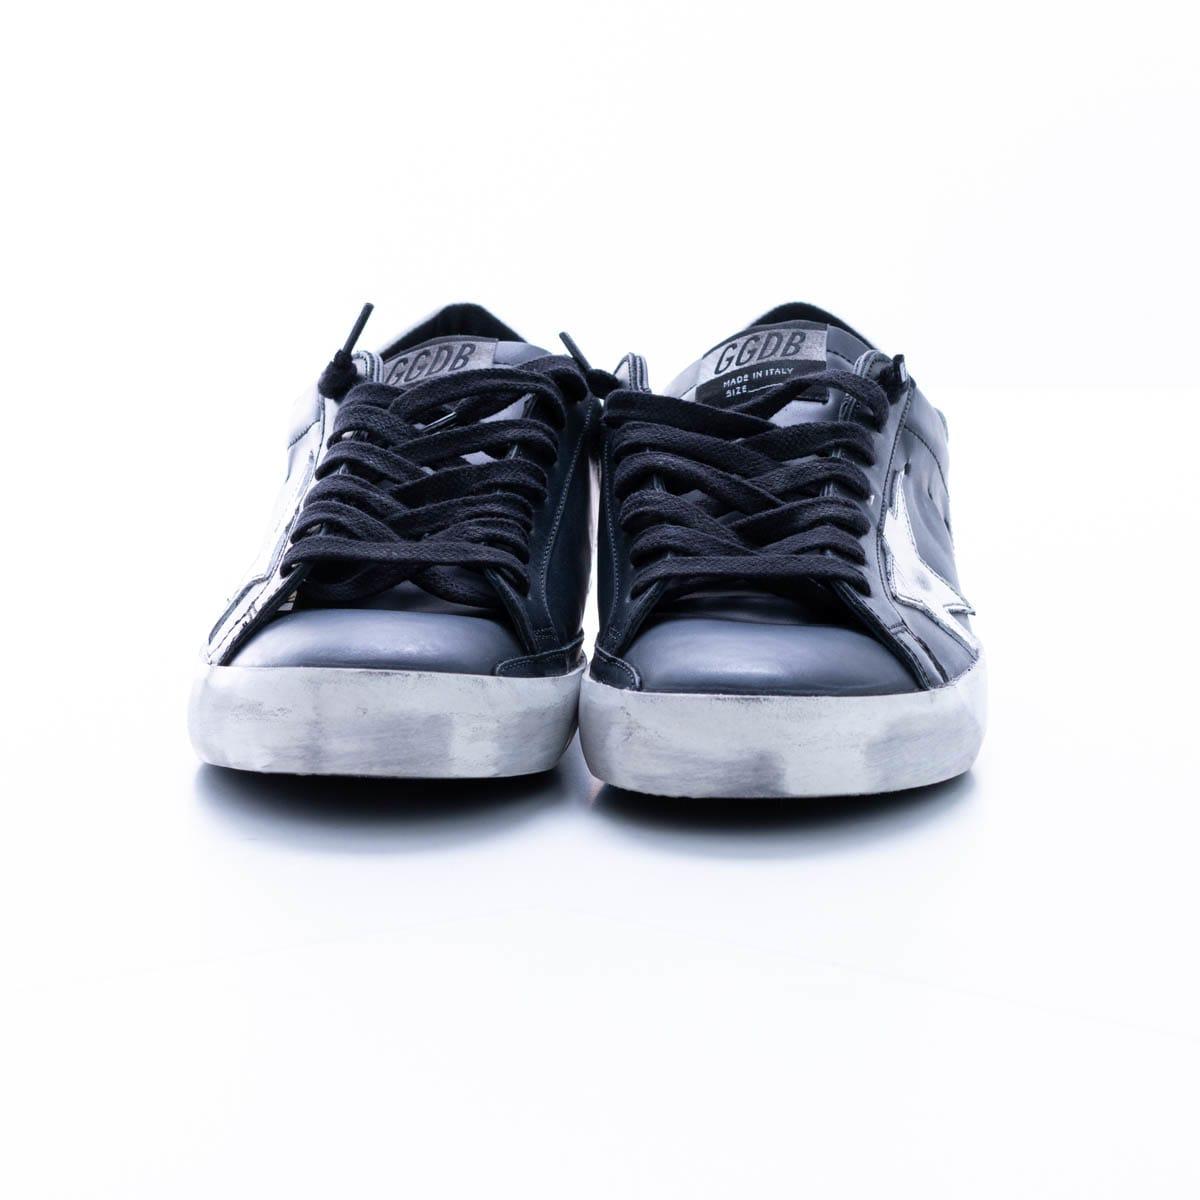 Golden Goose Super-star Leather Sneaker In Black - White